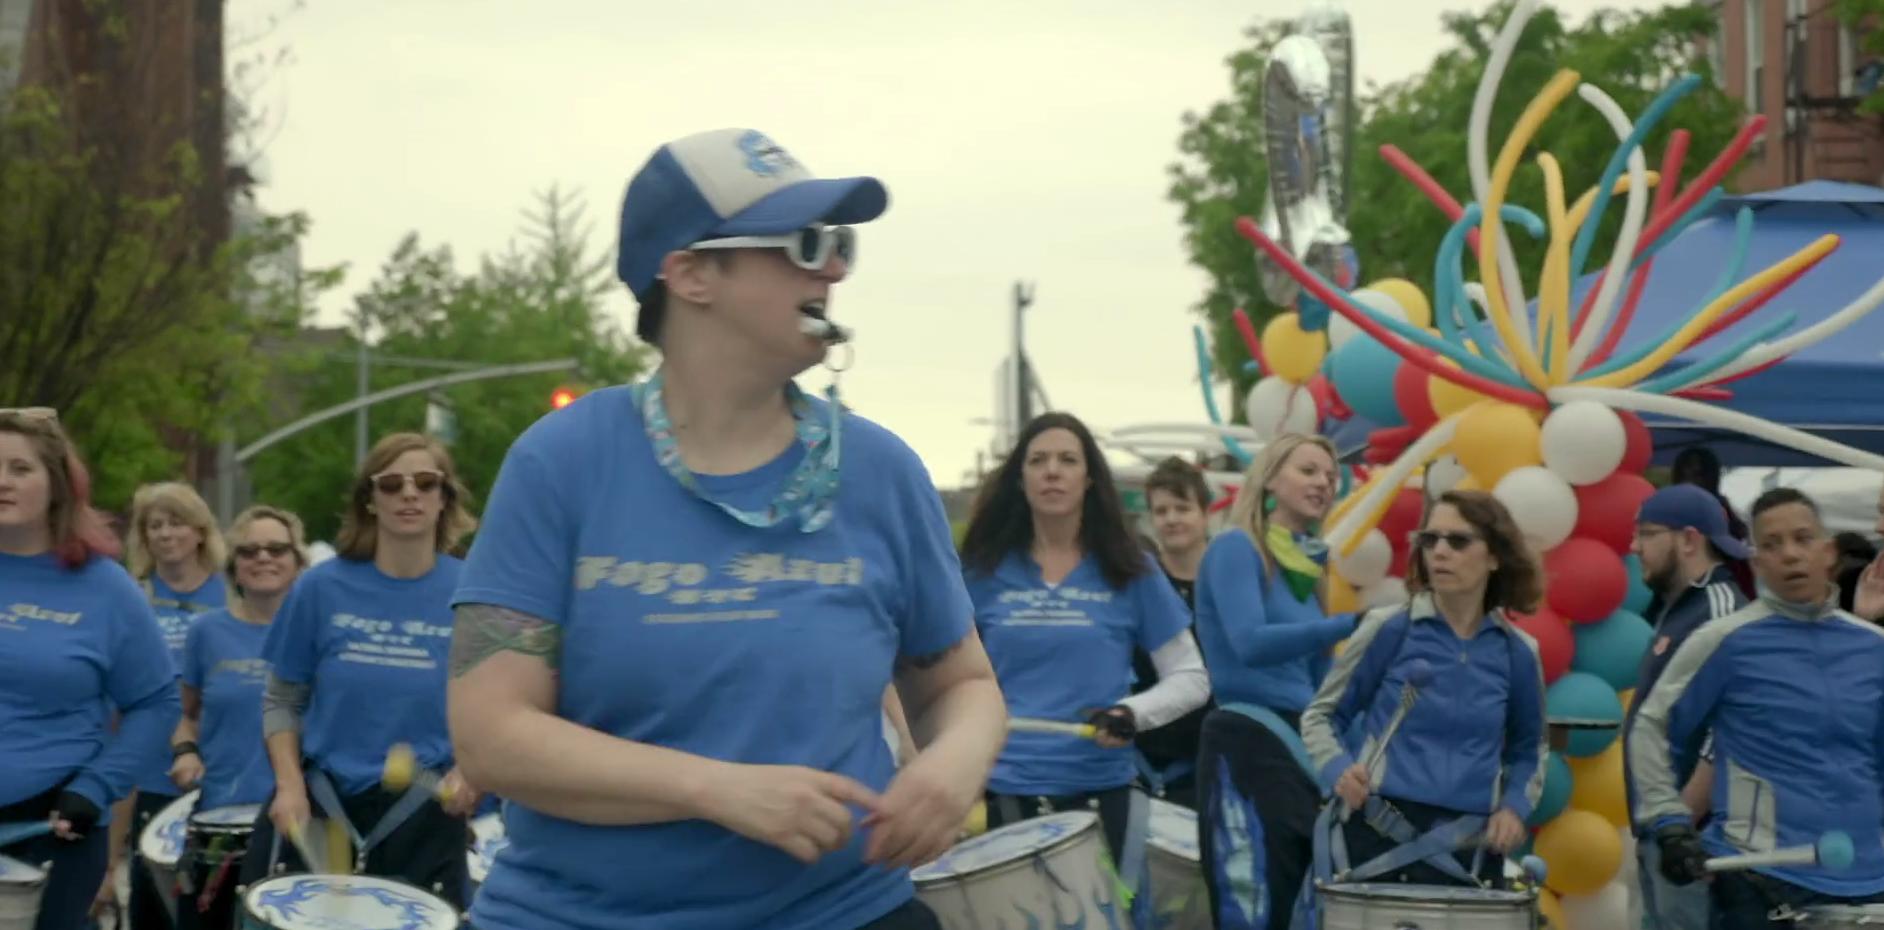 Fogo Azul - Long Island City Performance